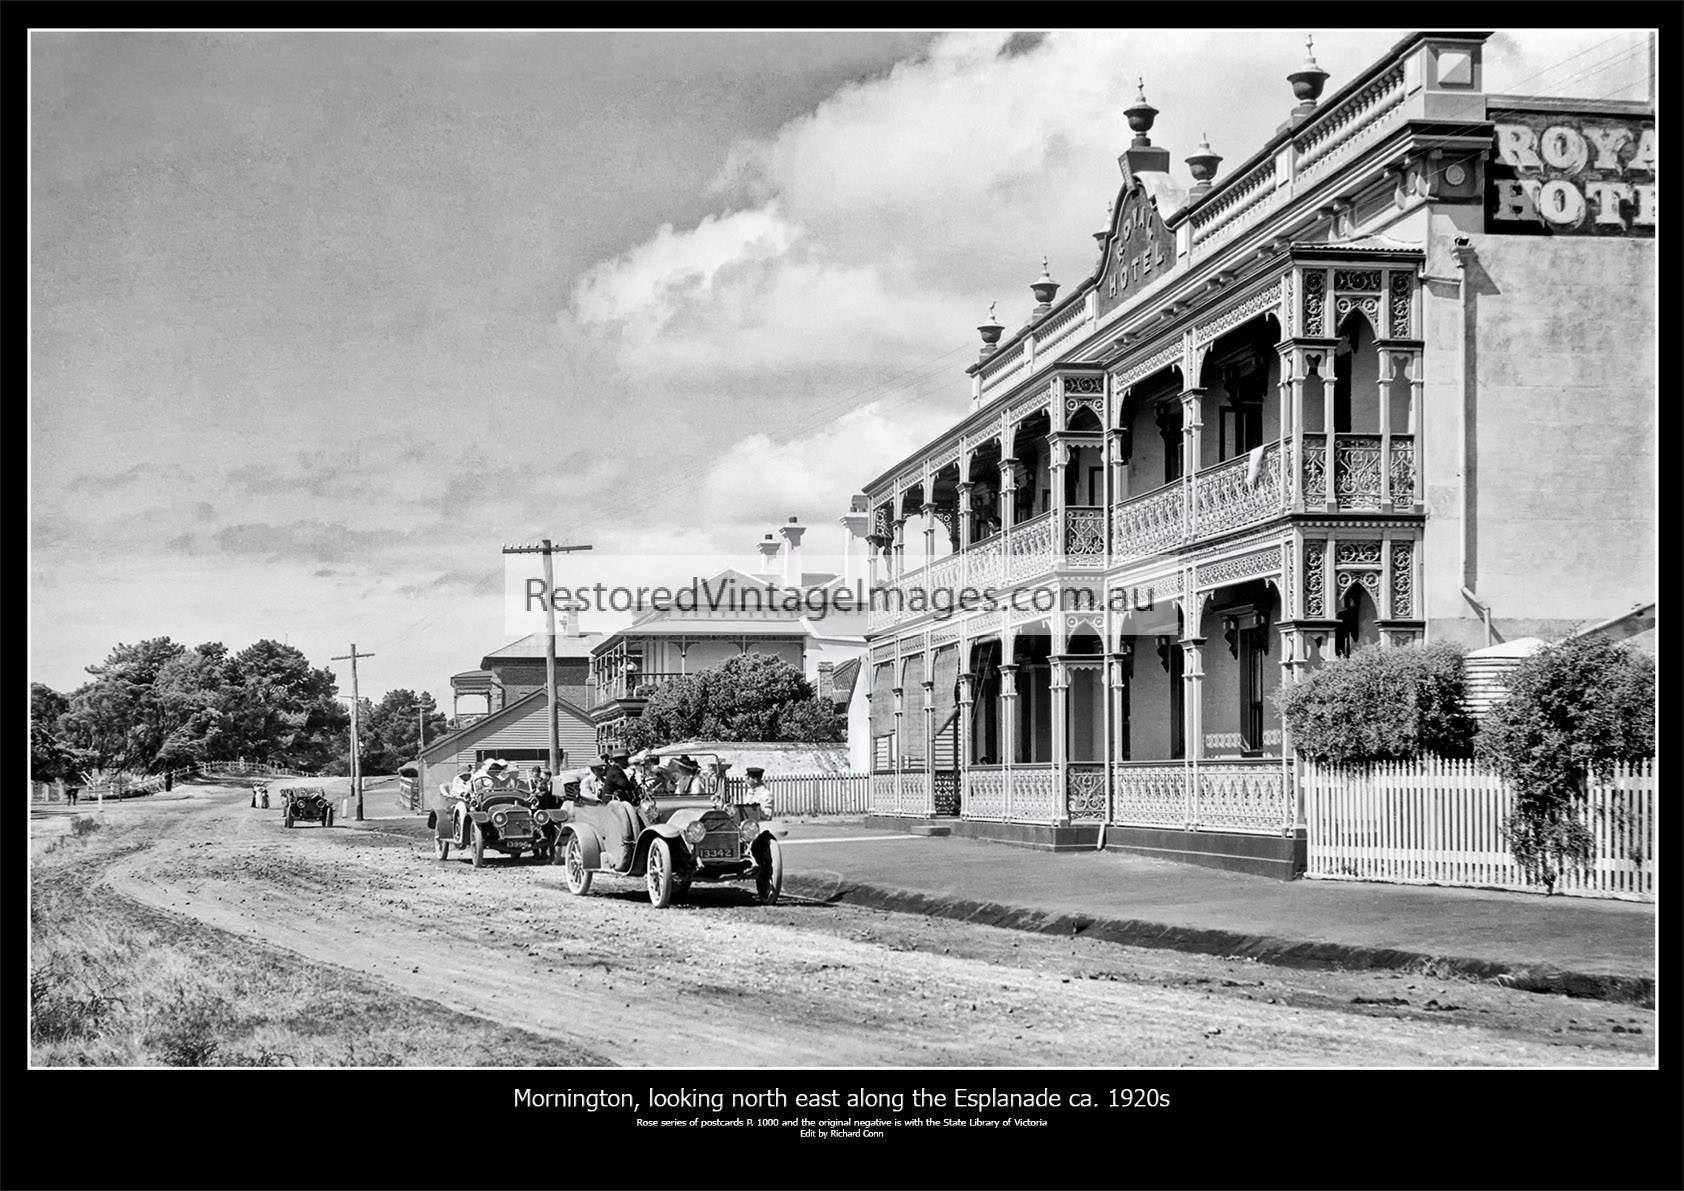 Mornington, Looking North East Along The Esplanade Ca. 1920s